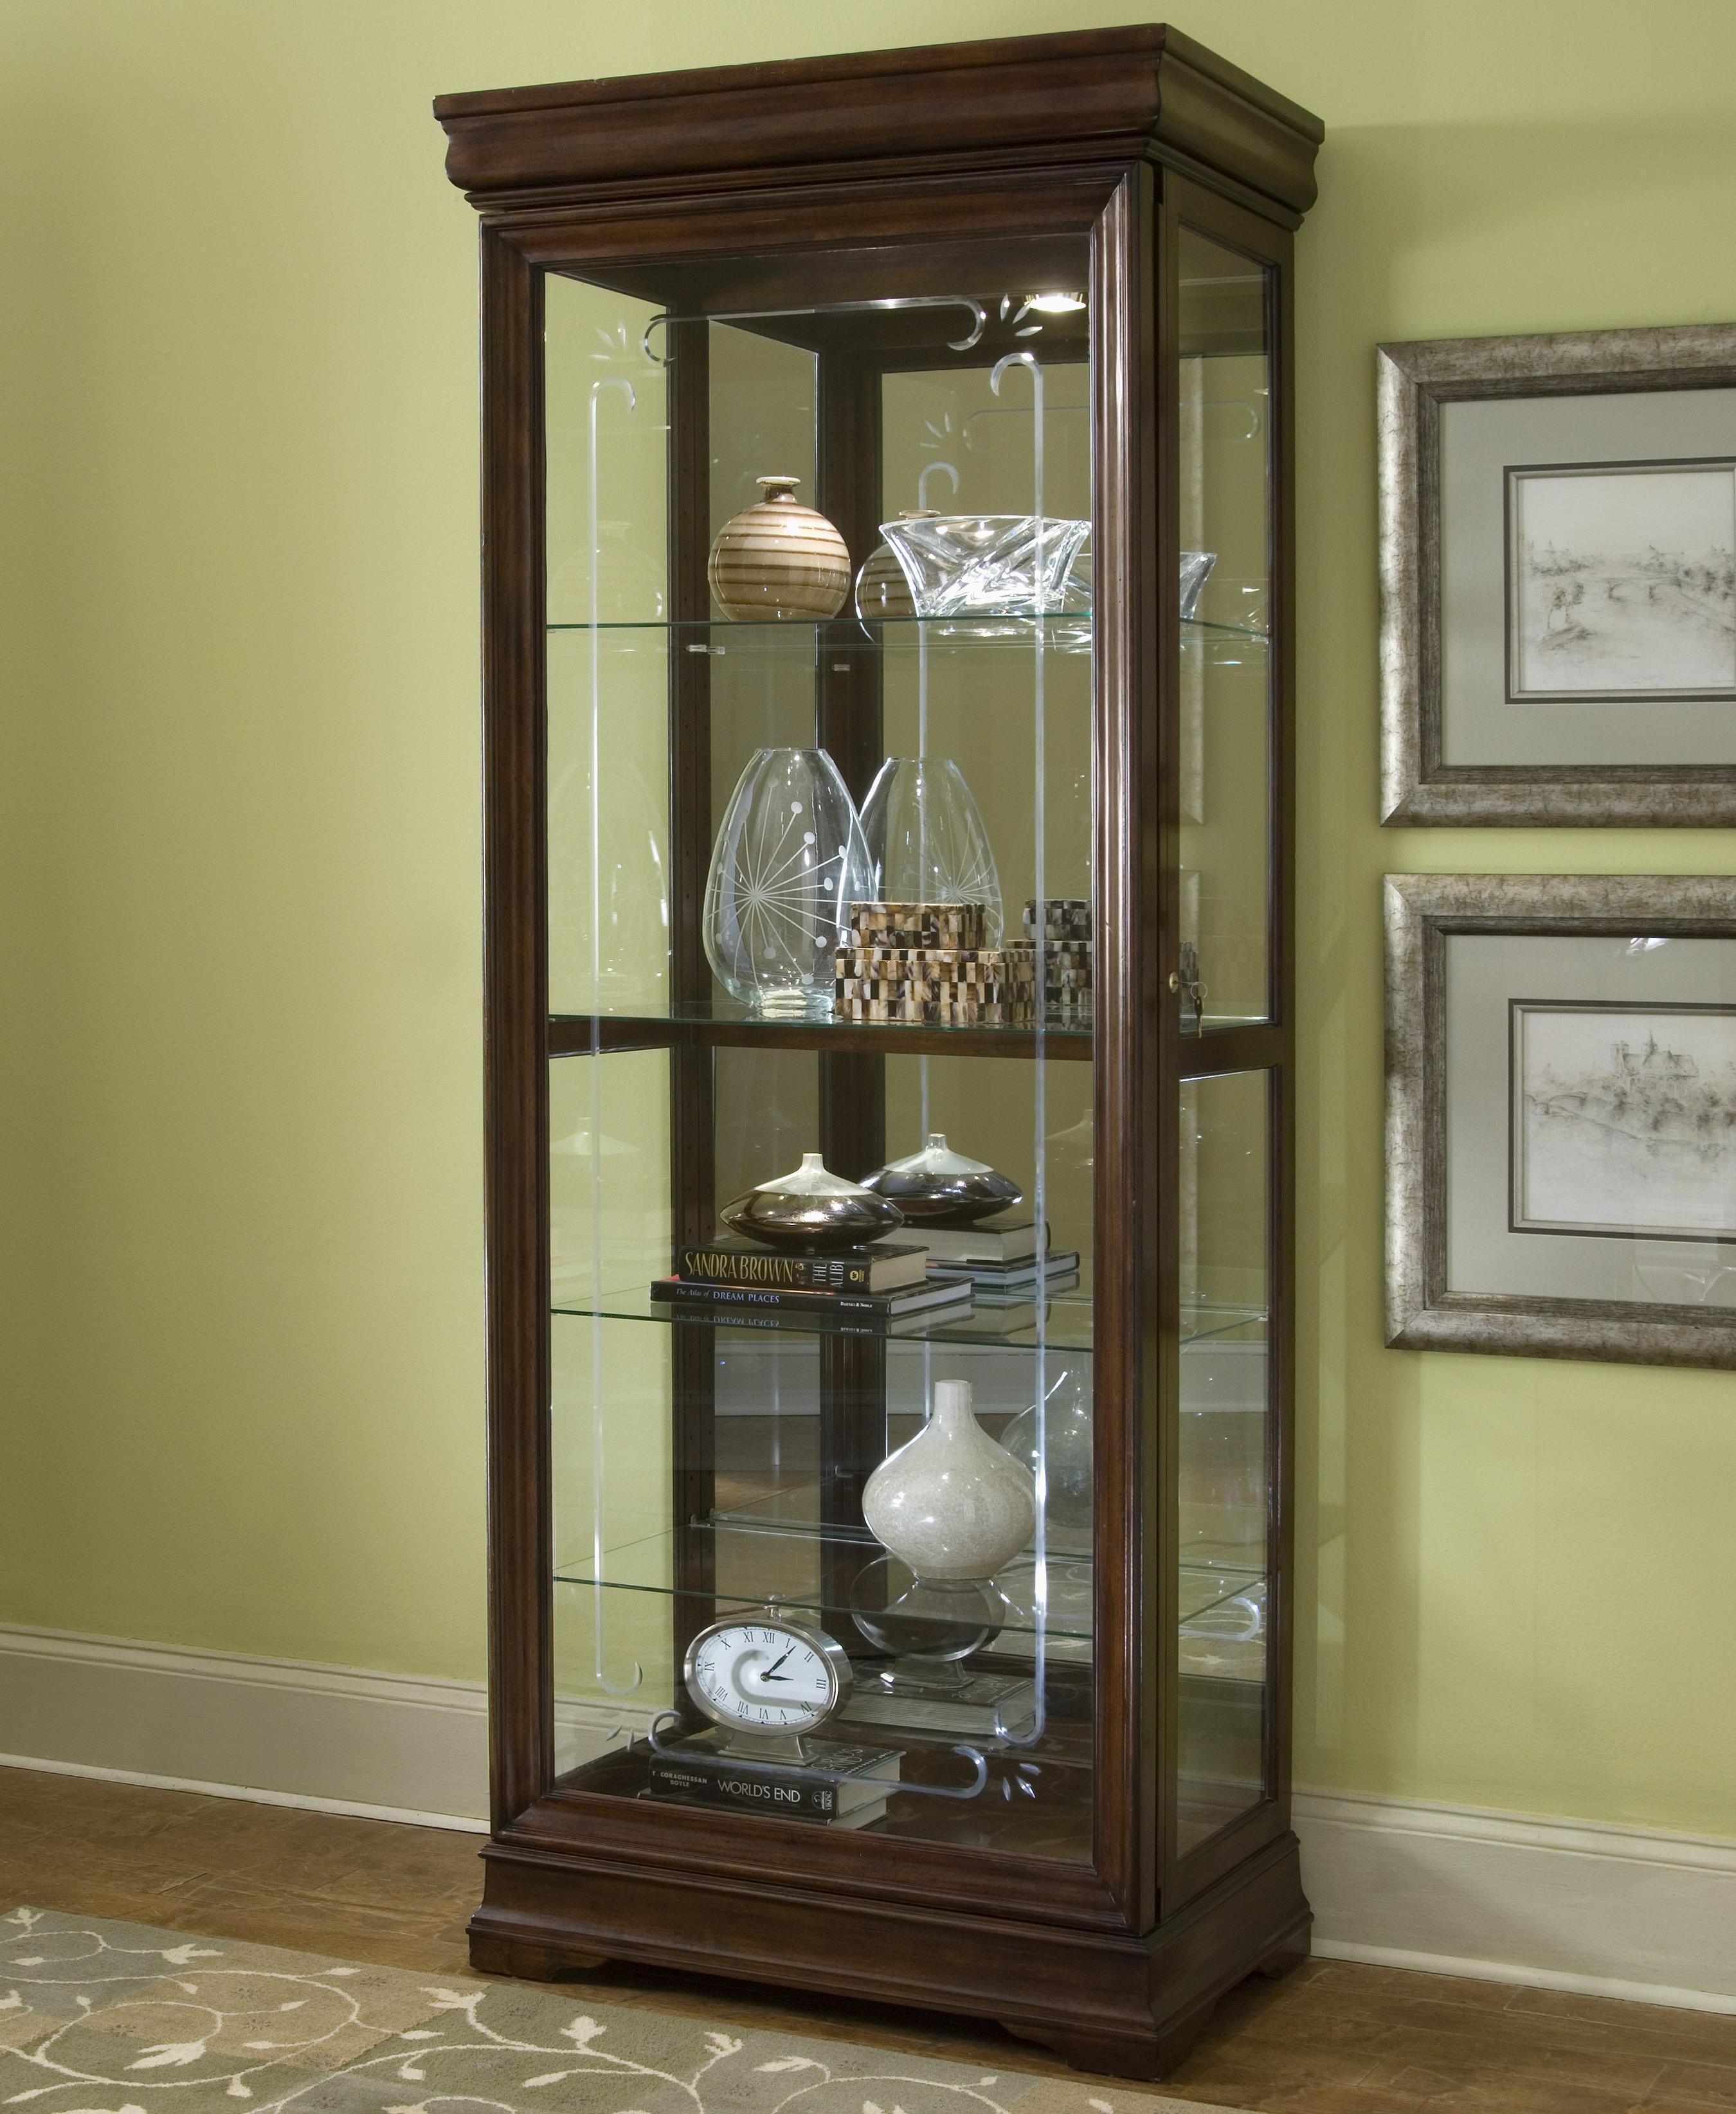 Pulaski furniture curios gallery curio cabinet olinde 39 s for Pulaski furniture